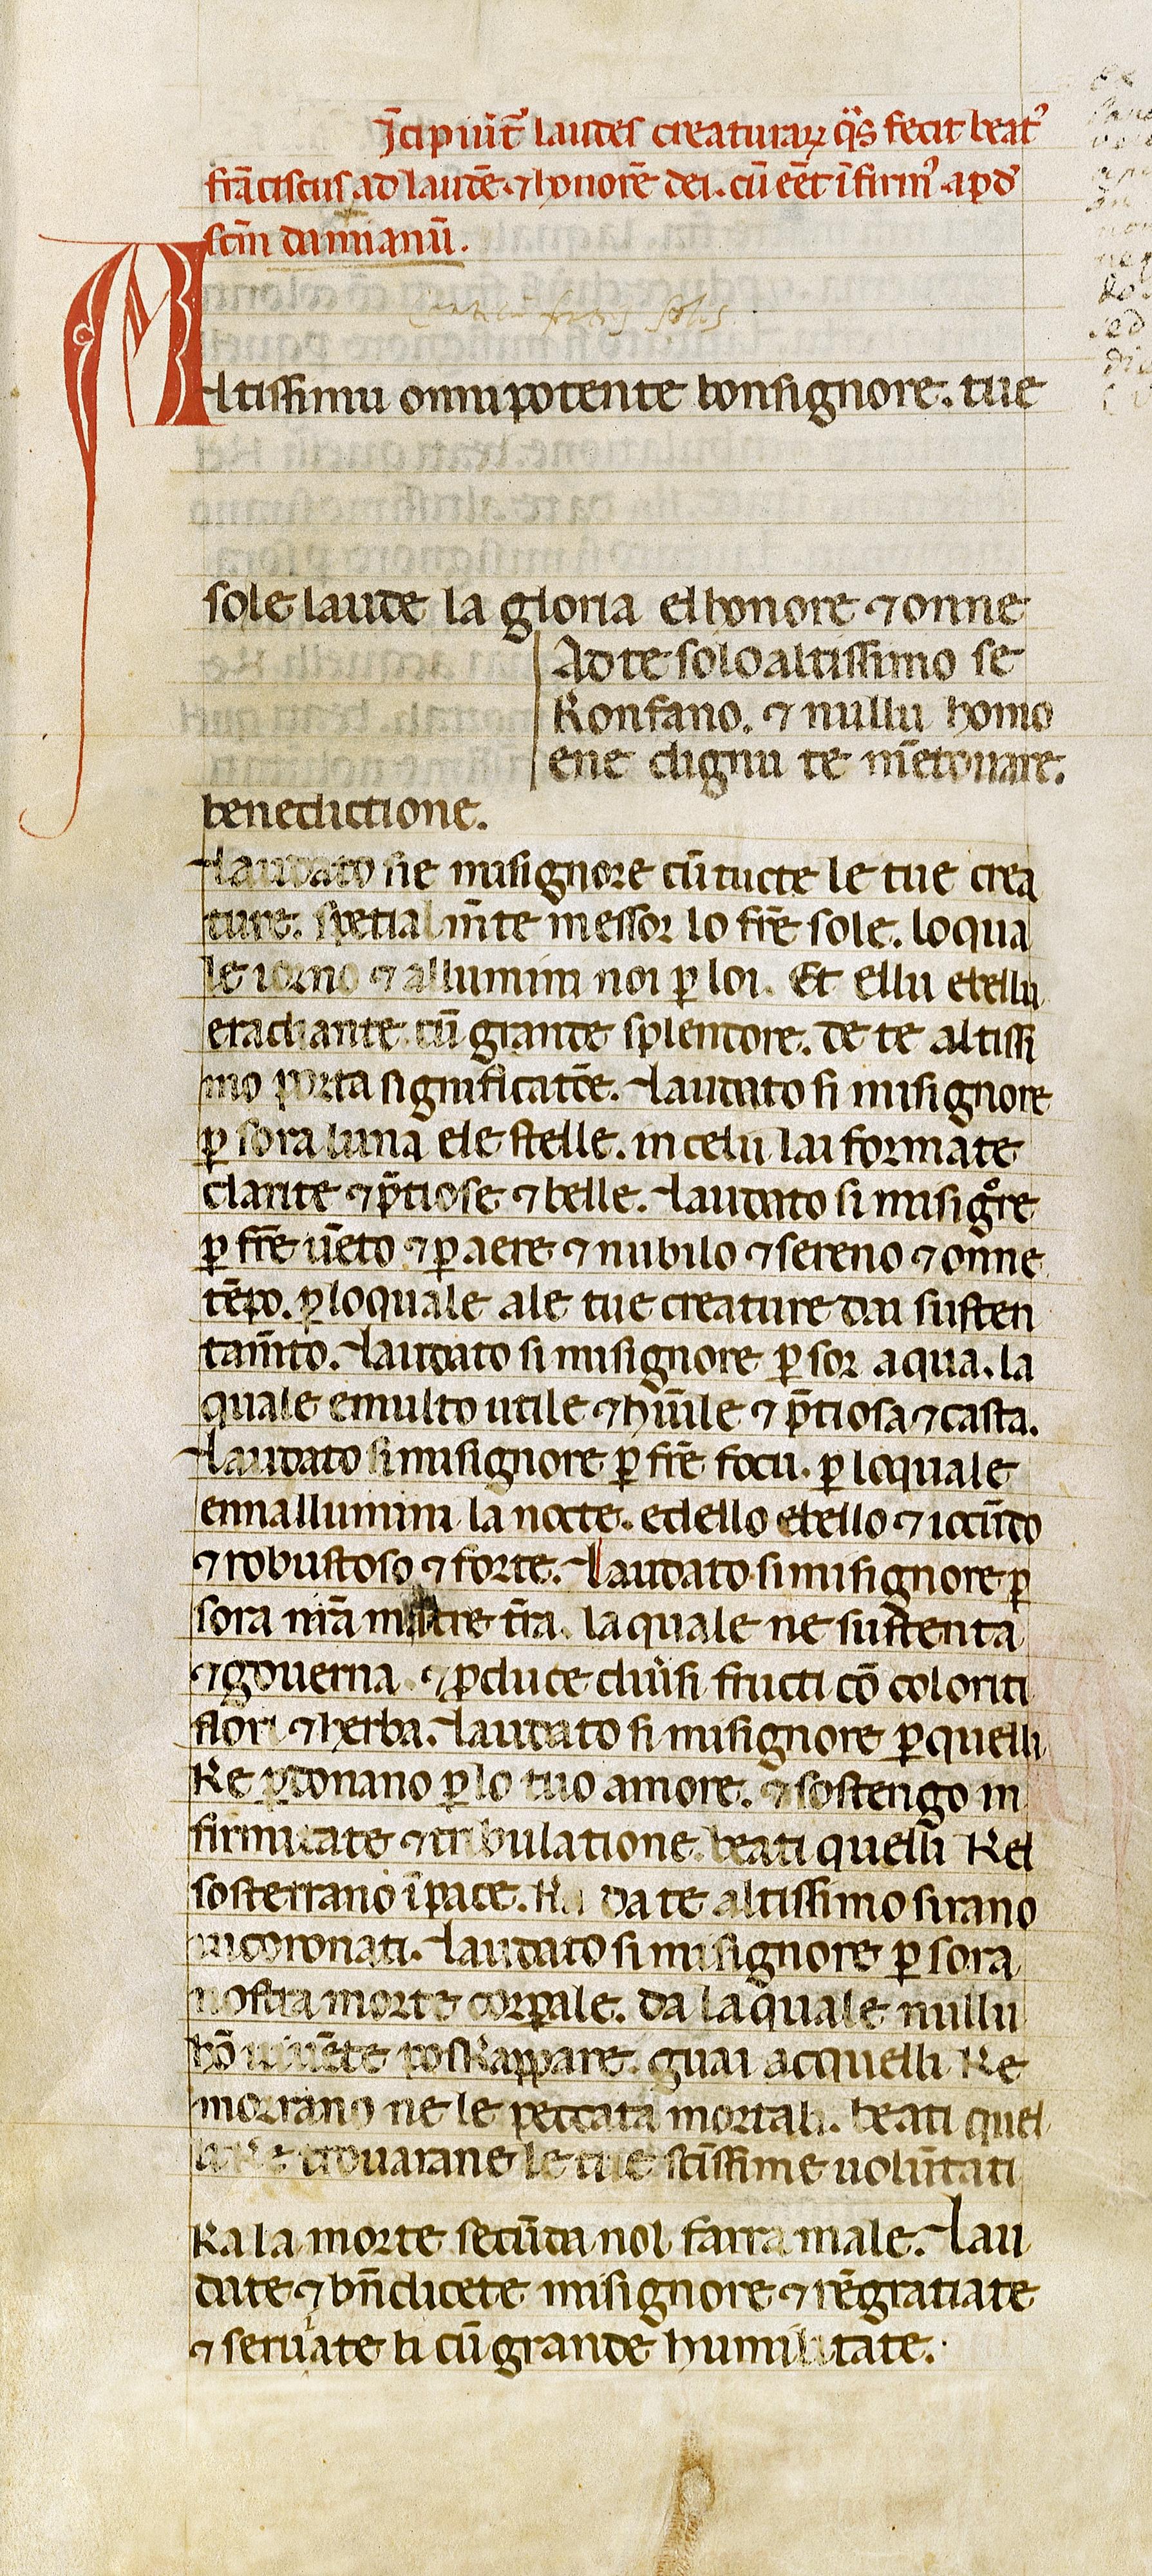 Fig. 1.  Codex 338, fols. 33r-34r, (composite), Biblioteca Communale Fondo Antico San Francesco, Assisi. Image ©1999 Stefan Diller Wuerzburg (www.assisi.de). Used by permission.